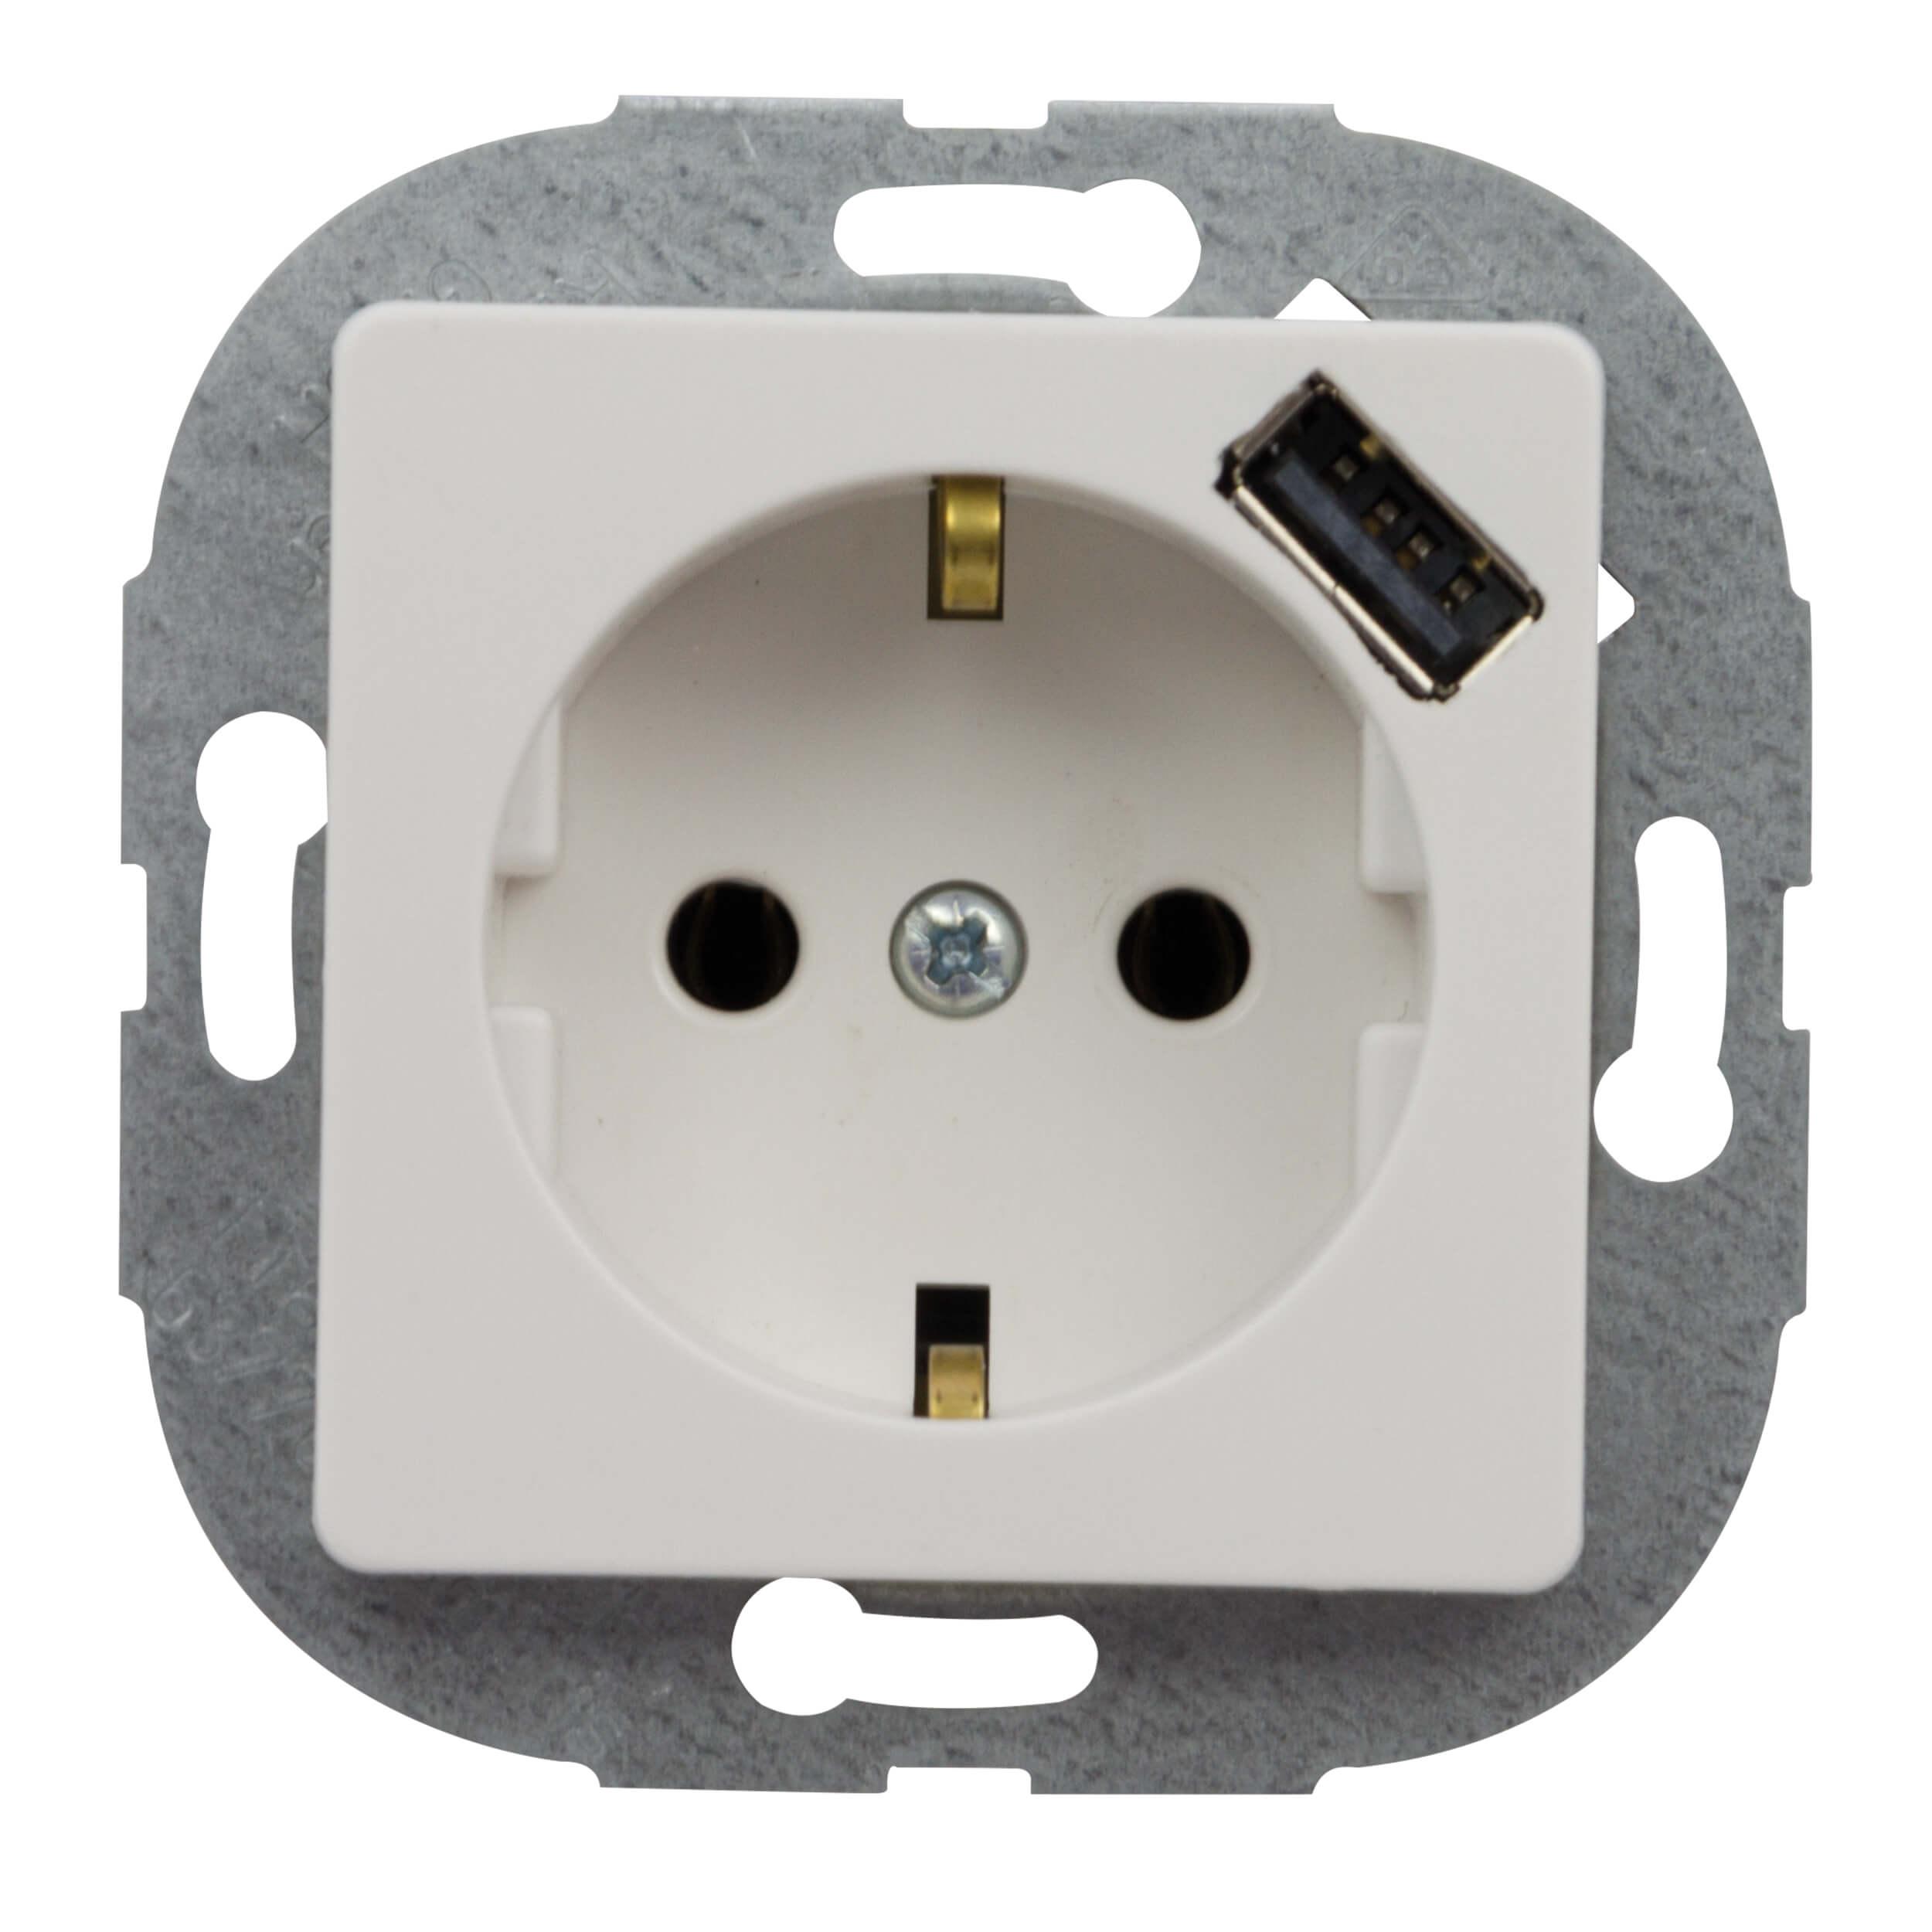 PrimaLuxe Steckdose mit 1 USB Anschuss weiss